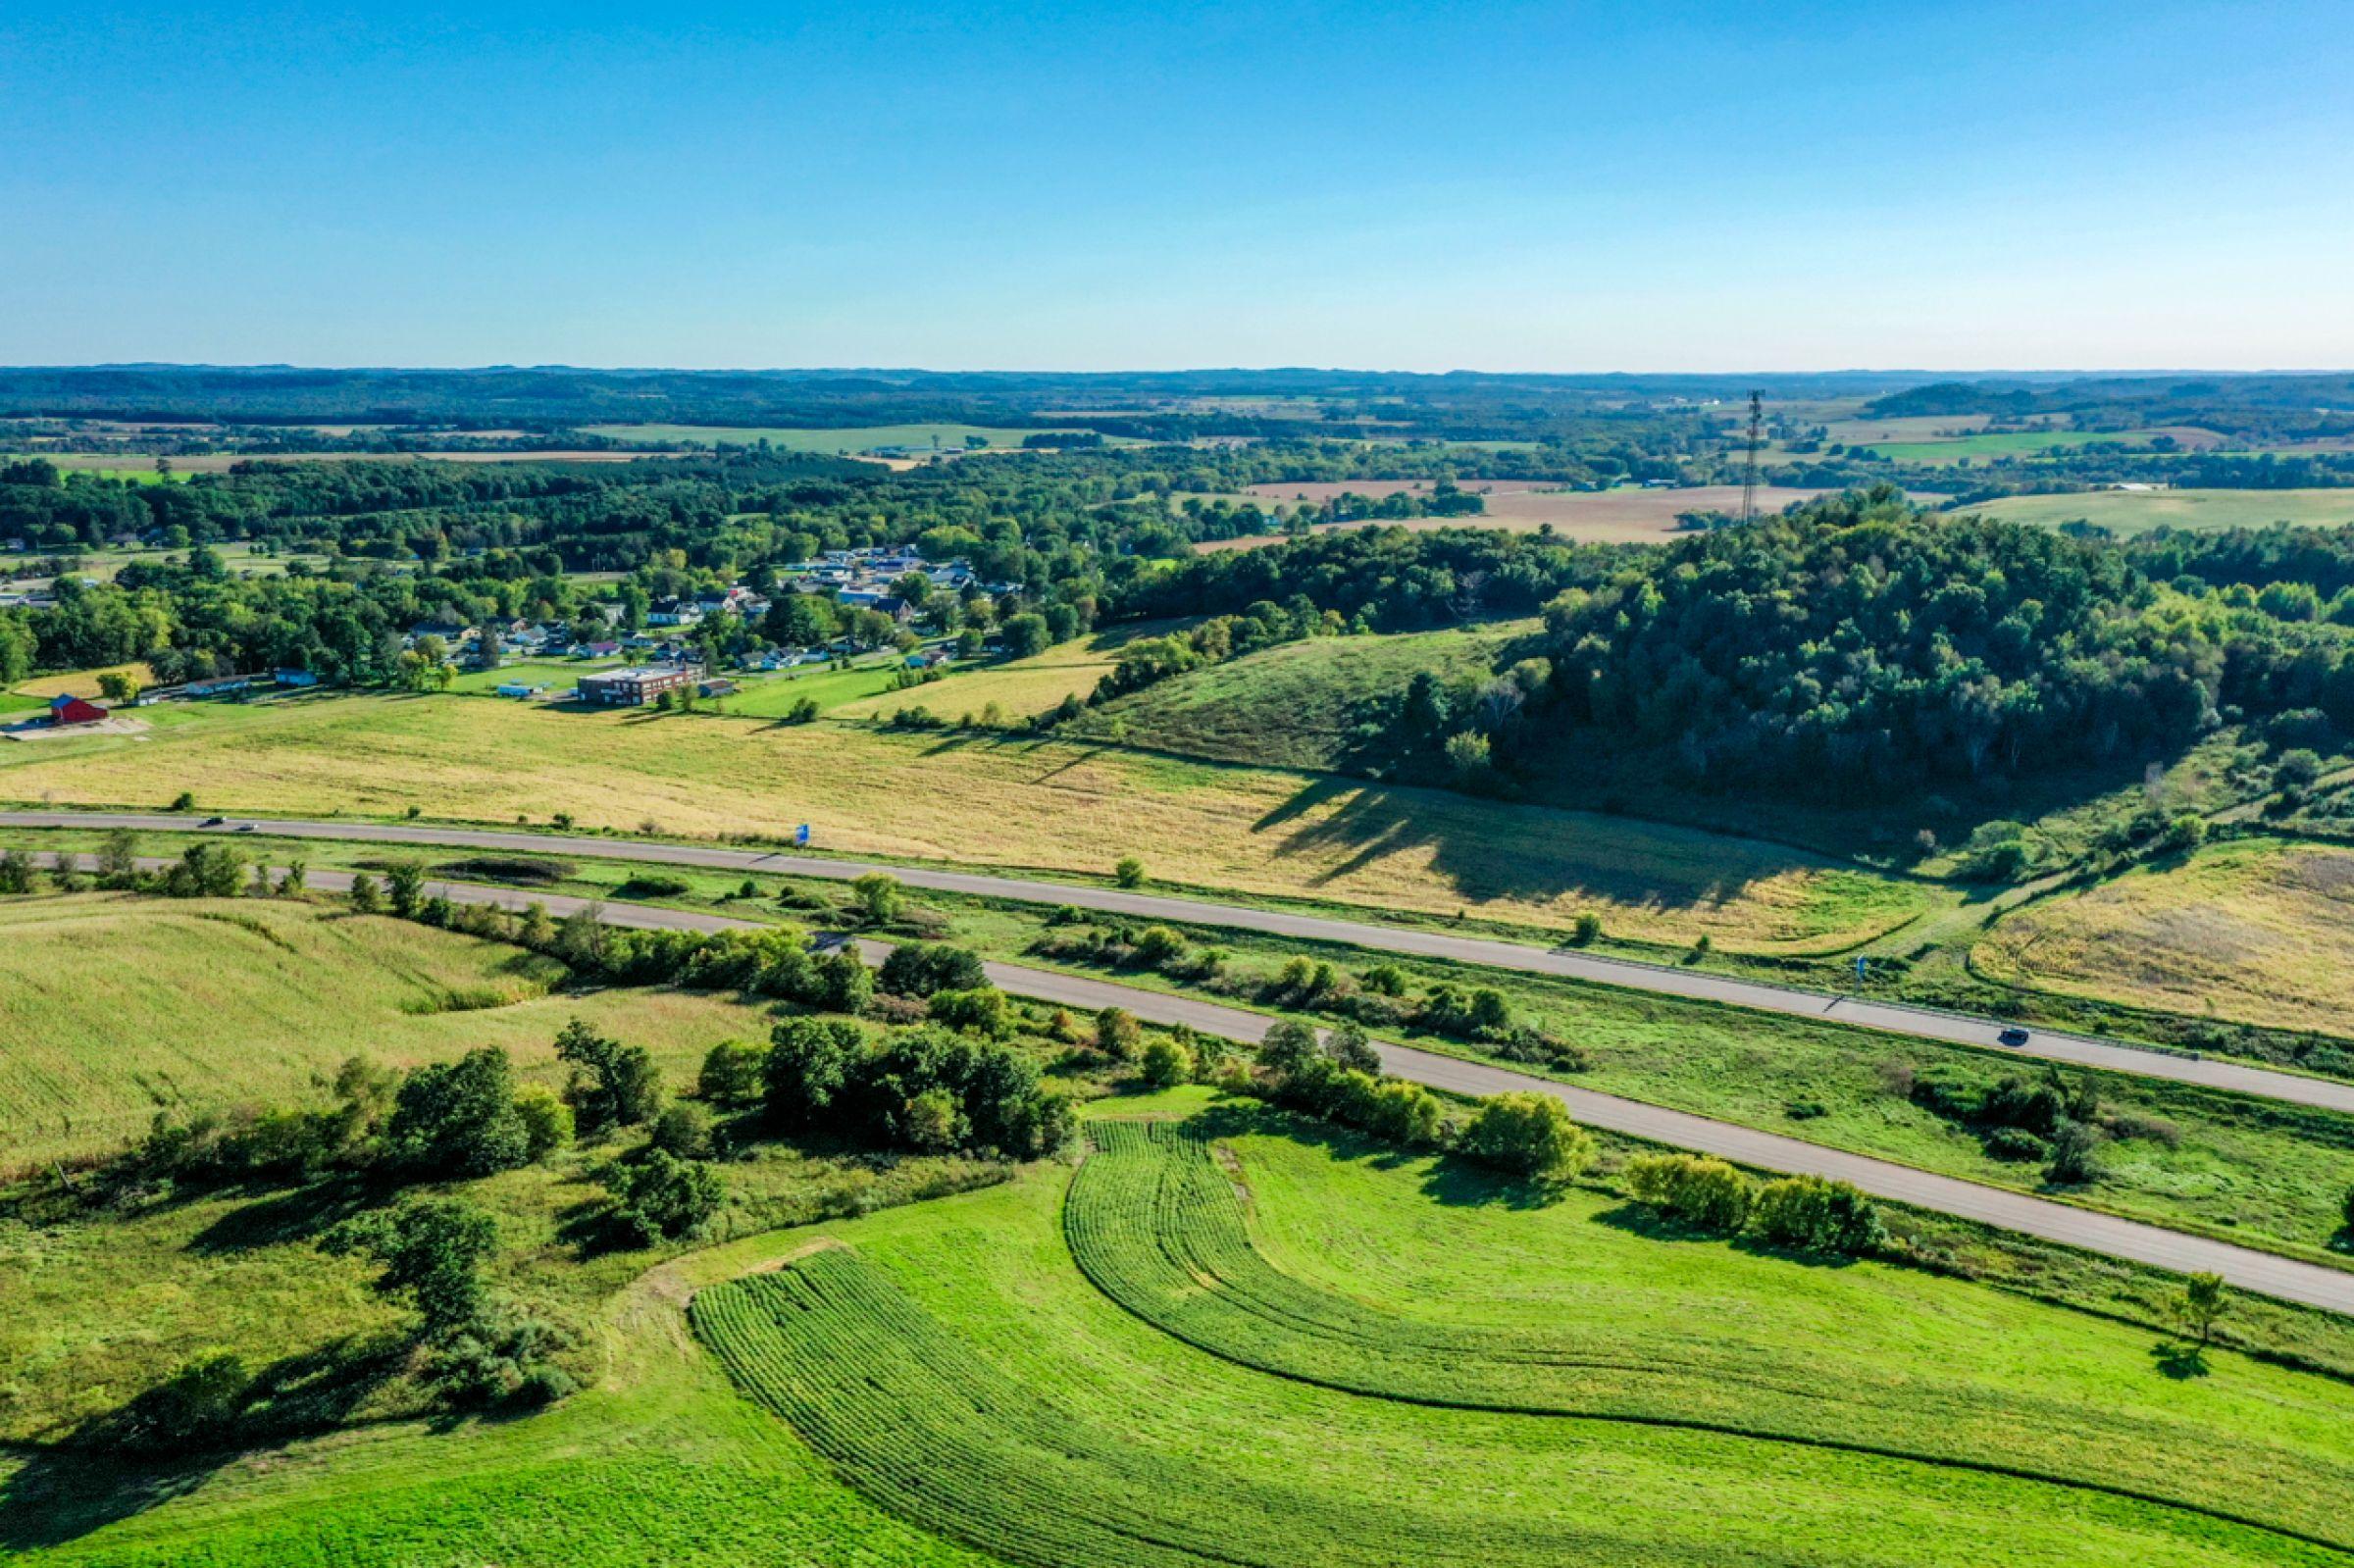 2-4449-acres-ml-3rd-street-hixton-54635-1-2021-09-16-164755.jpg